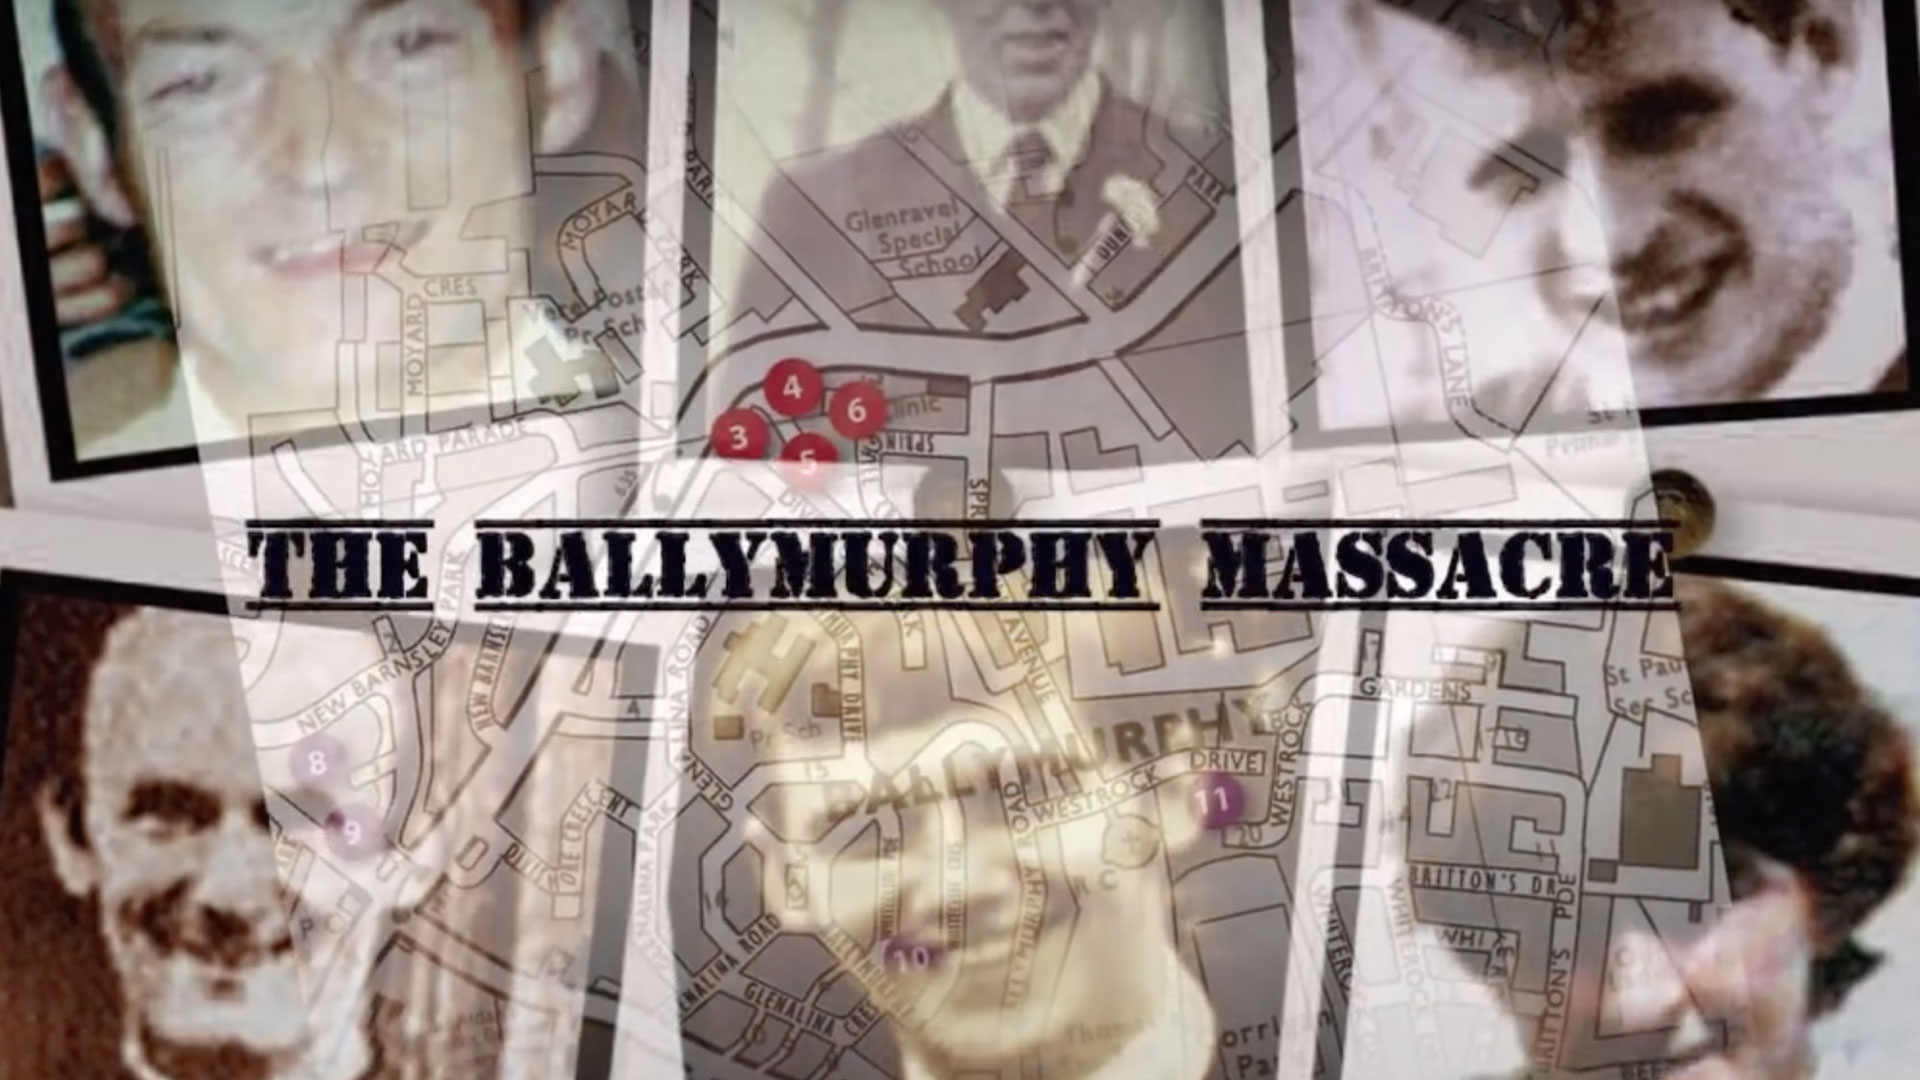 The Ballymurphy Massacre. - Award winning documentary